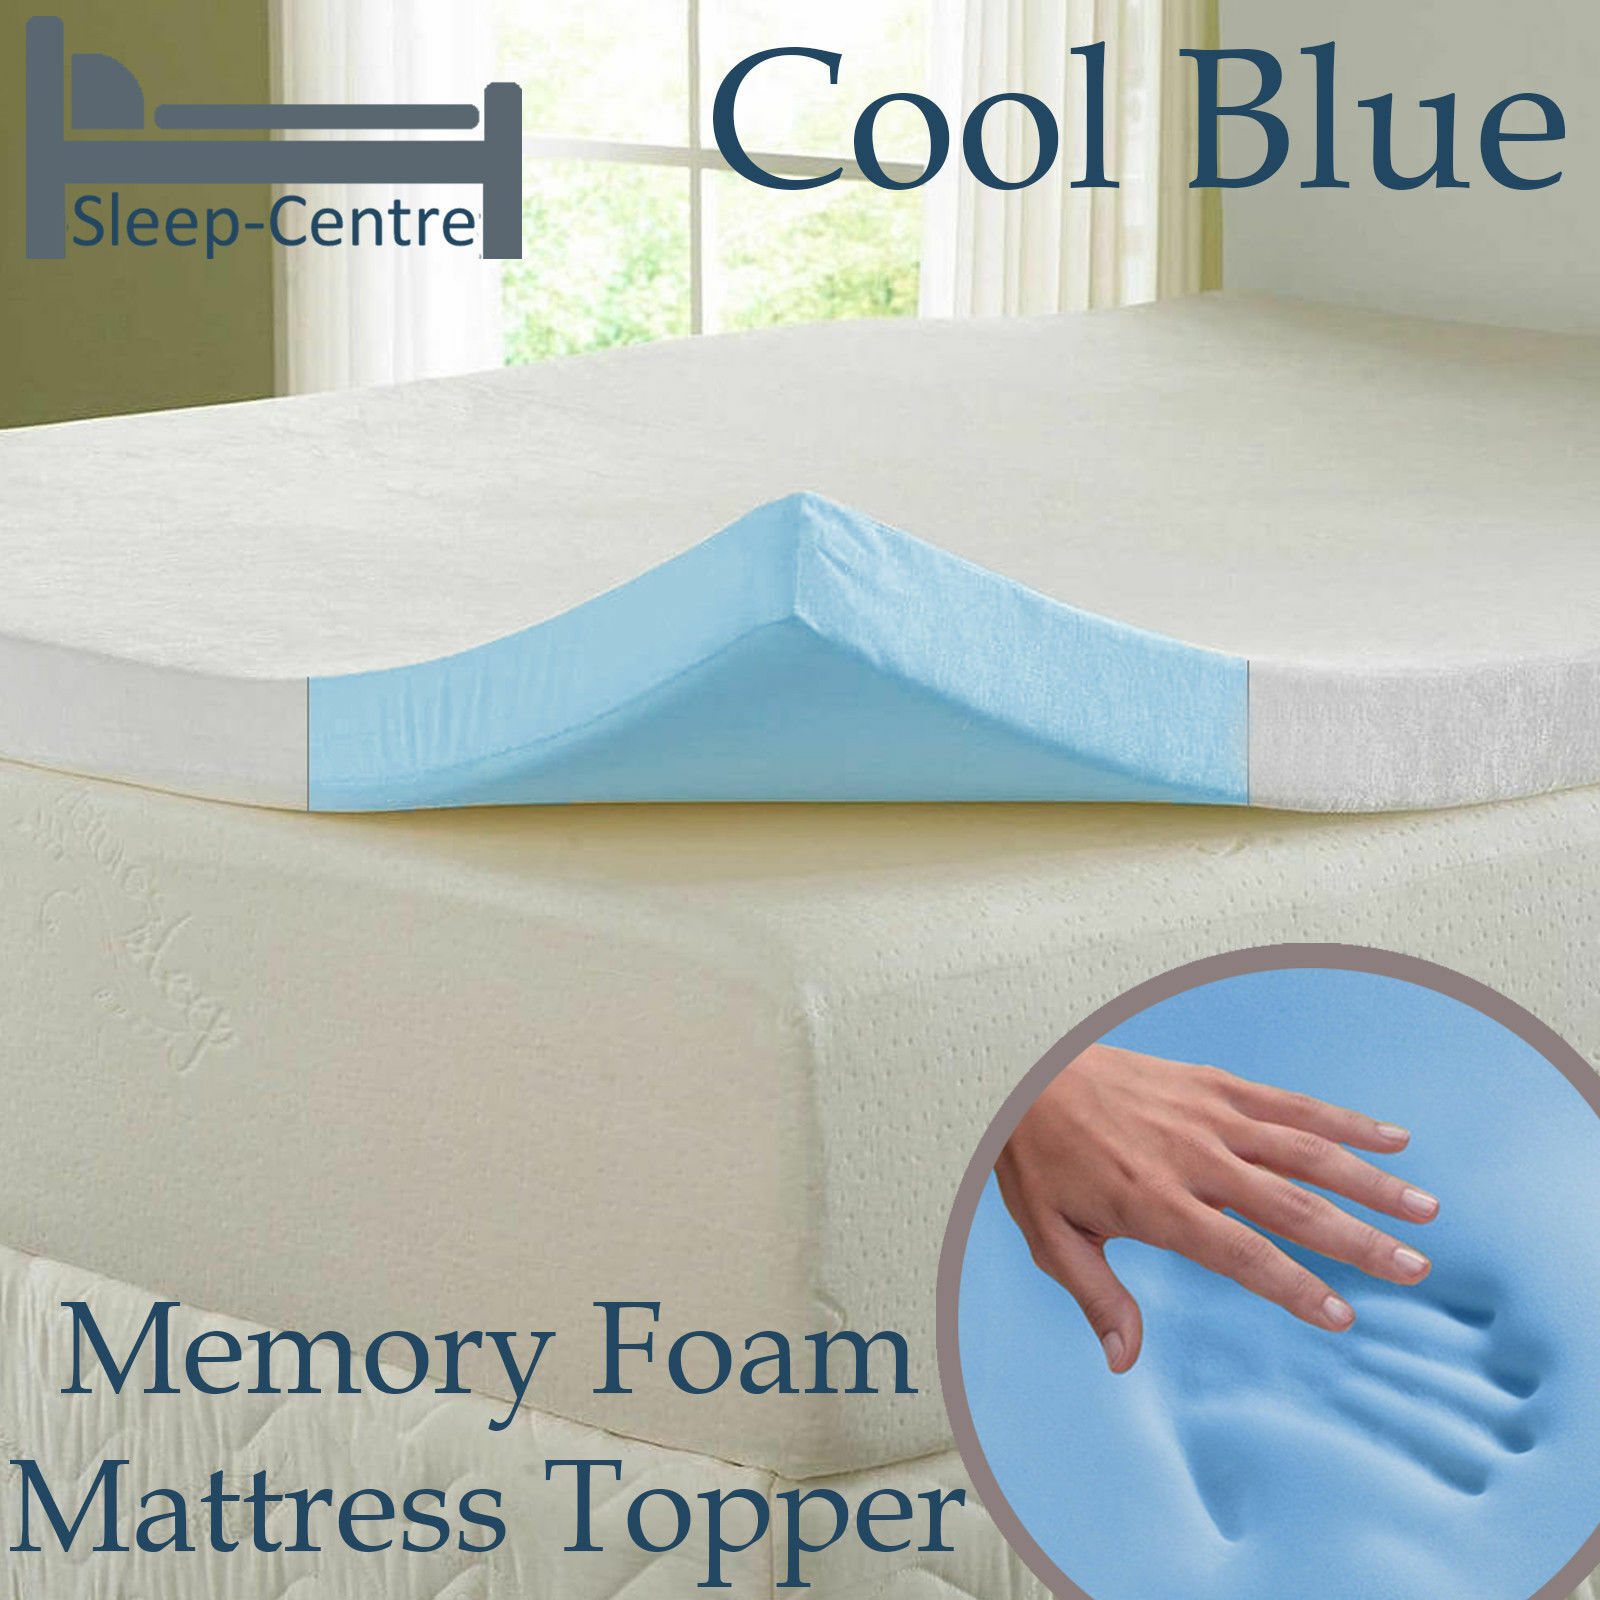 COOL Blau MEMORY FOAM TOPPER, ALL GrößeS,DEPTHS & StKunstseite OPTION. 1 ,2 ,3 ,4